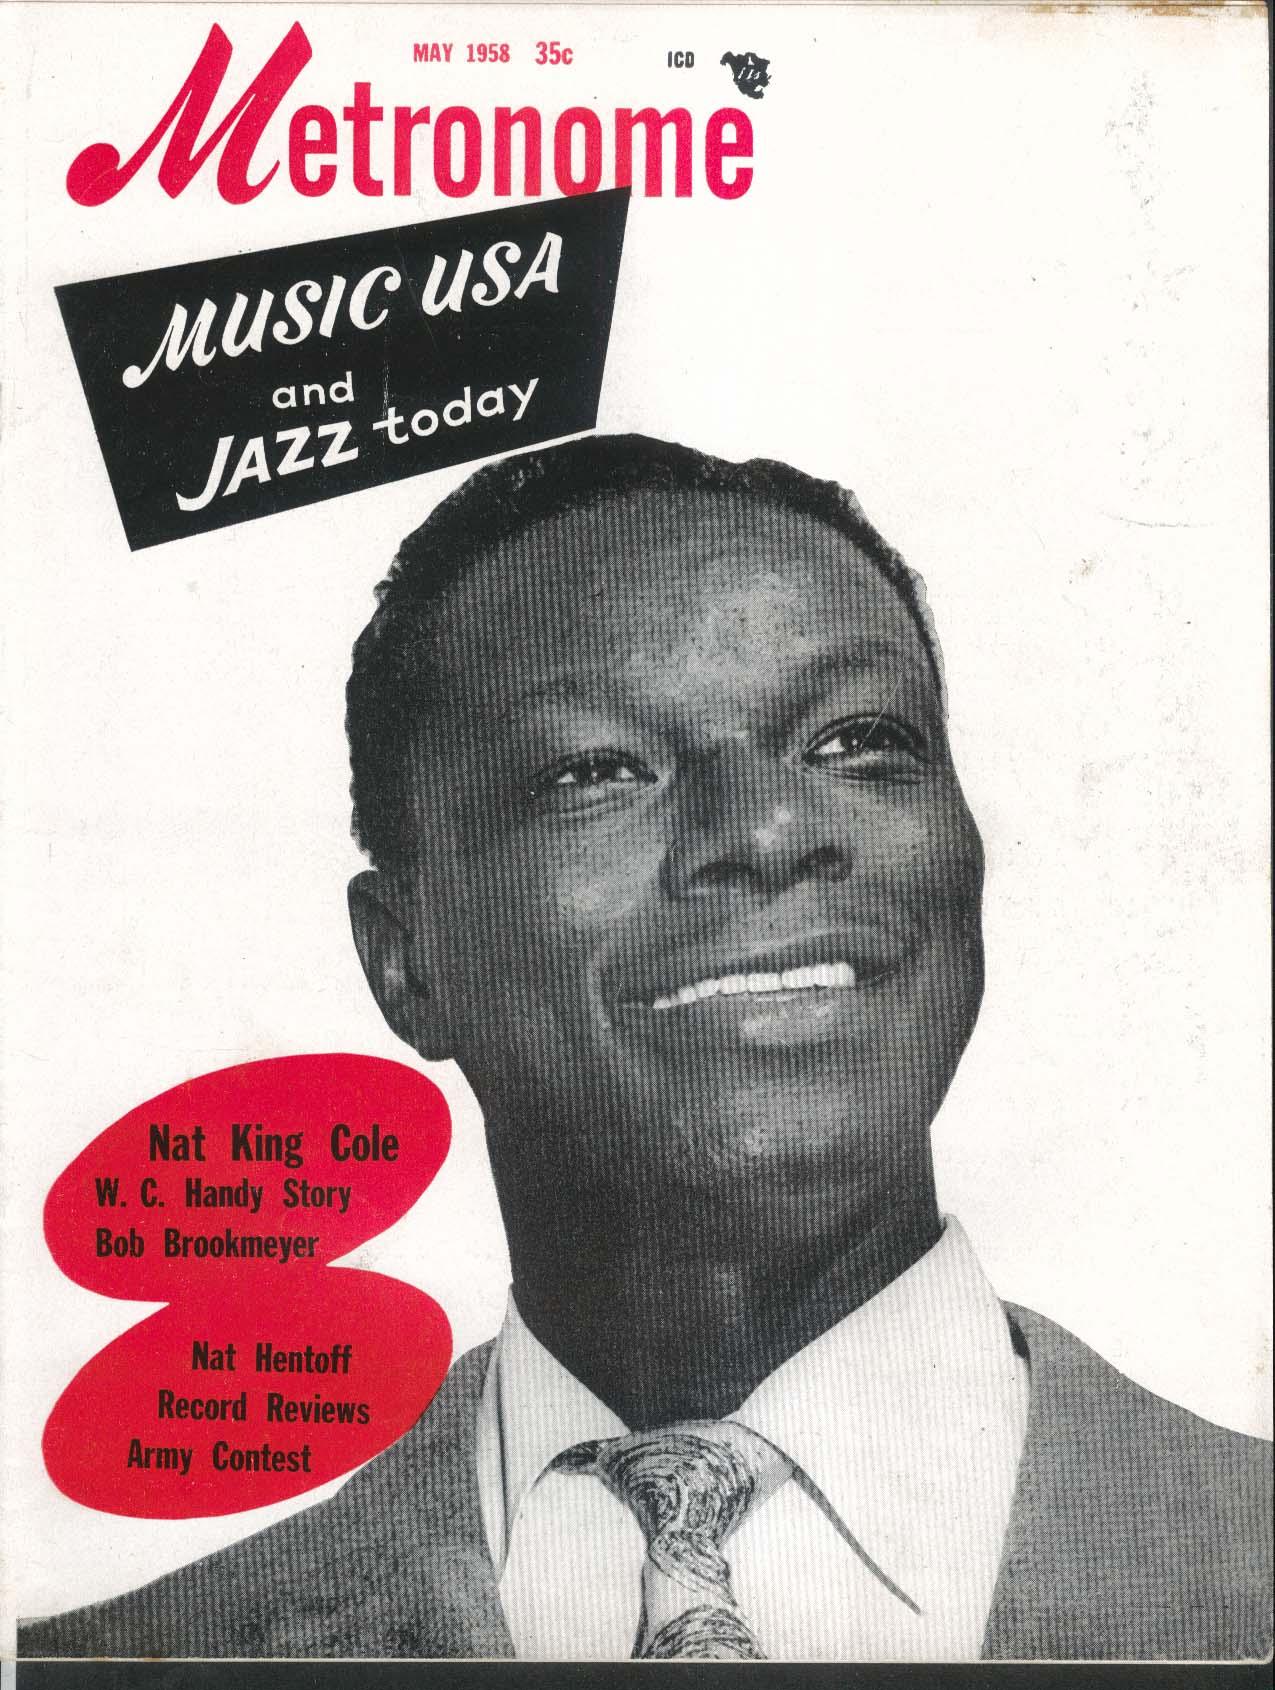 METRONOME Nat King Cole W C Handy Bob Brookmeyer Hentoff 5 1958